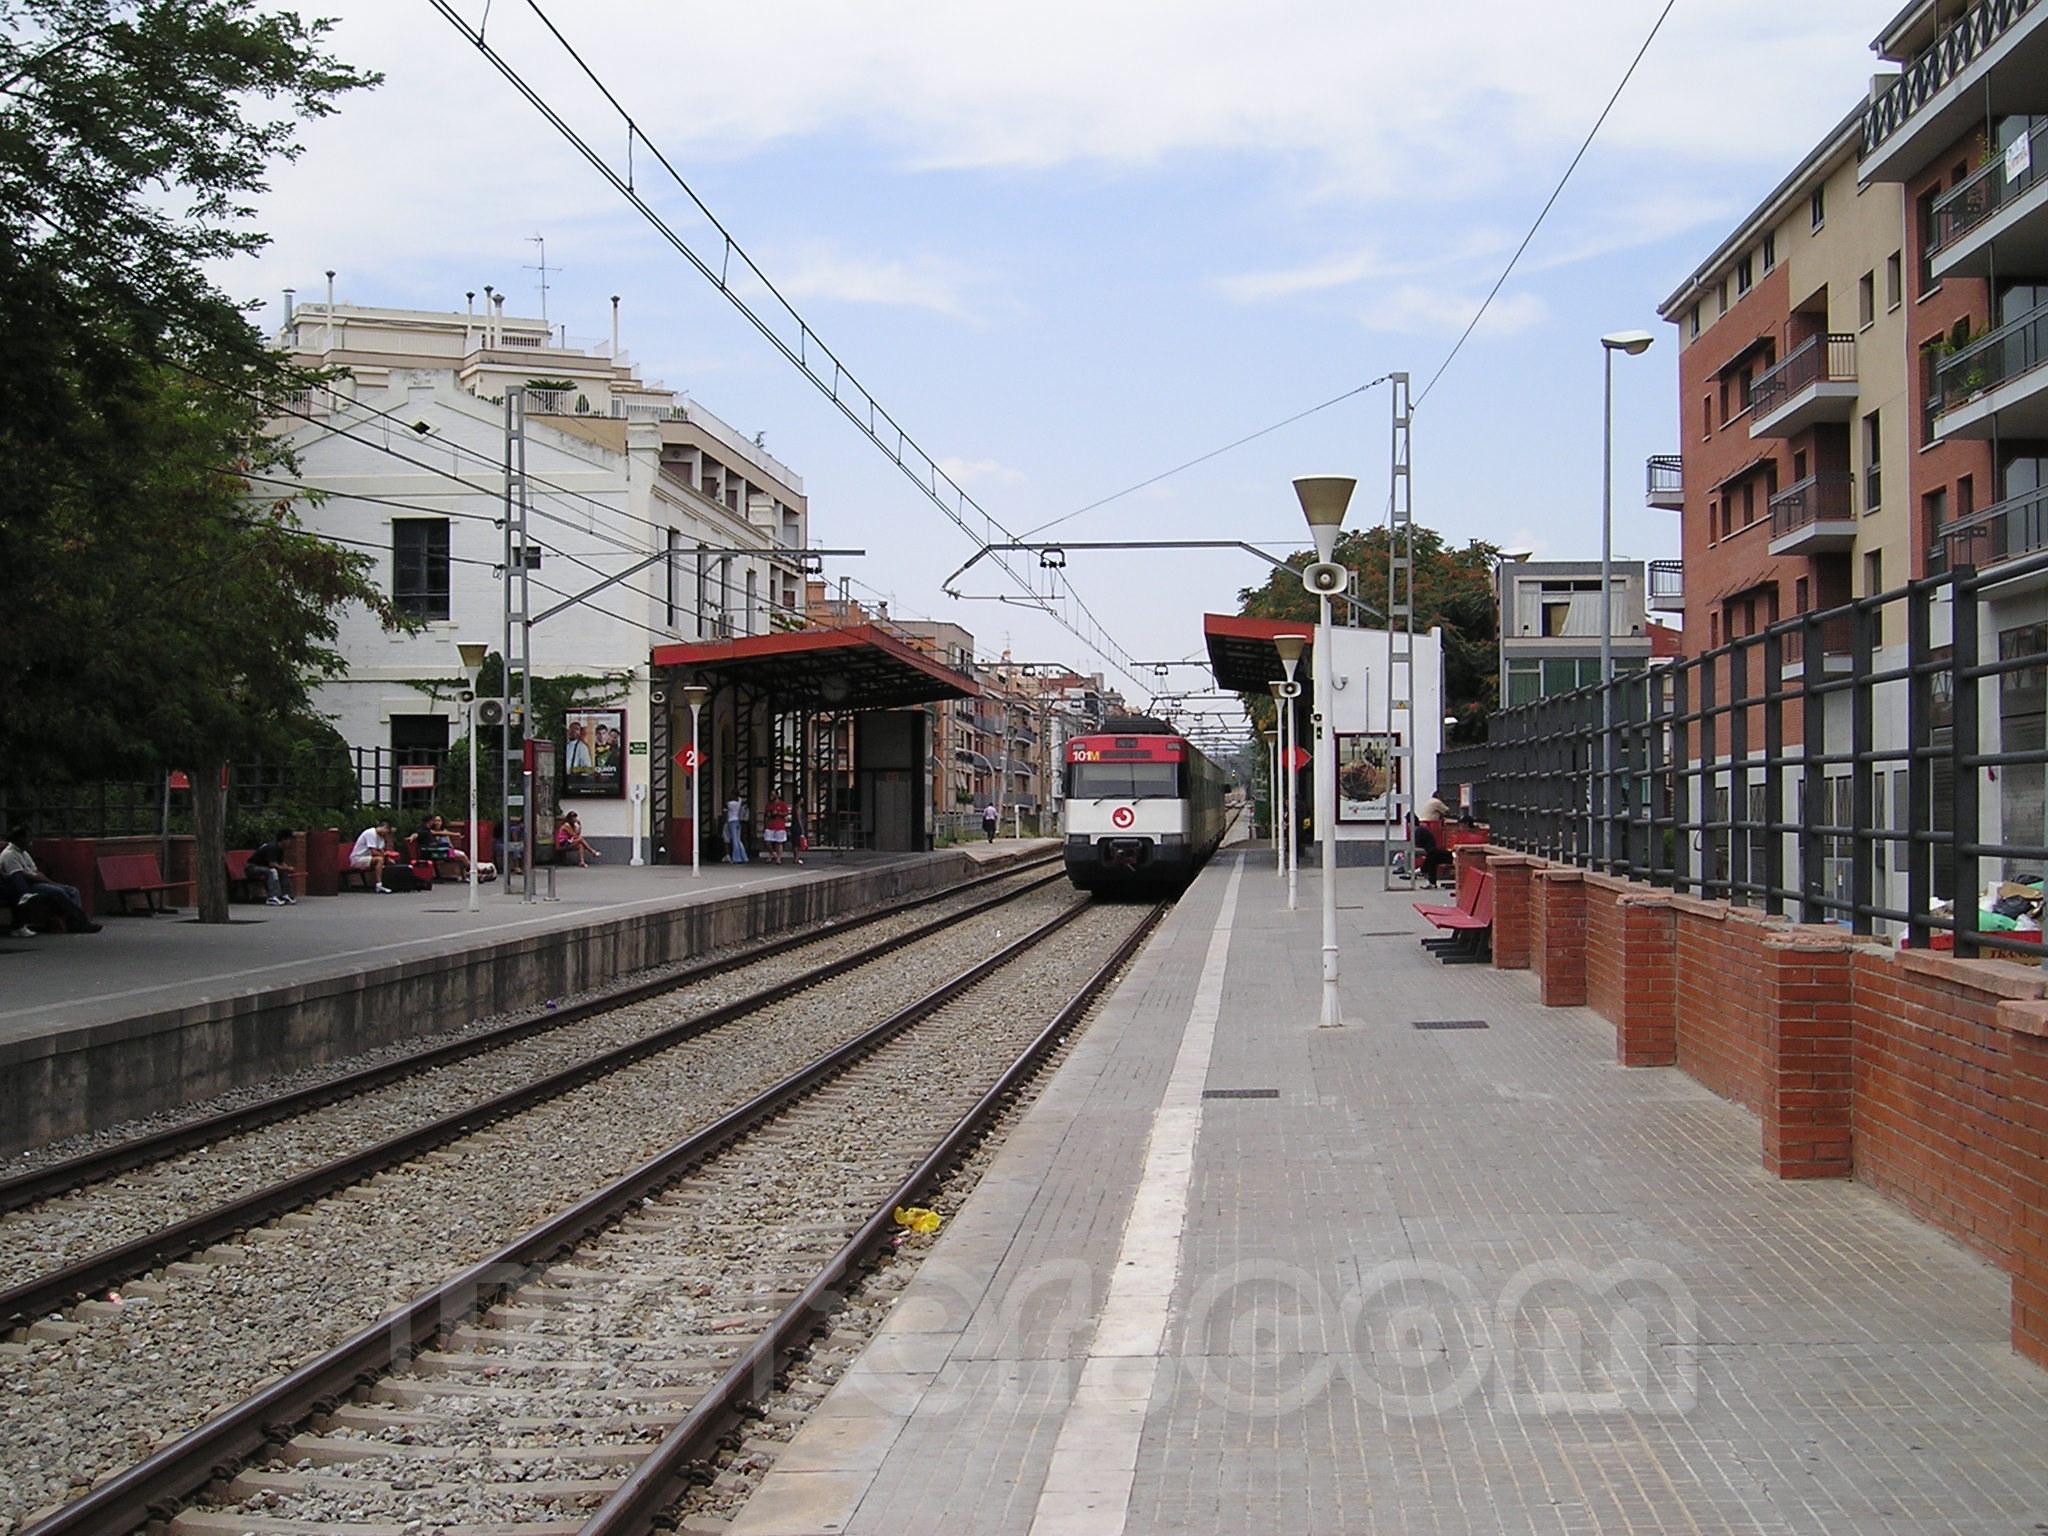 Renfe / ADIF: Cerdanyola del Vallès